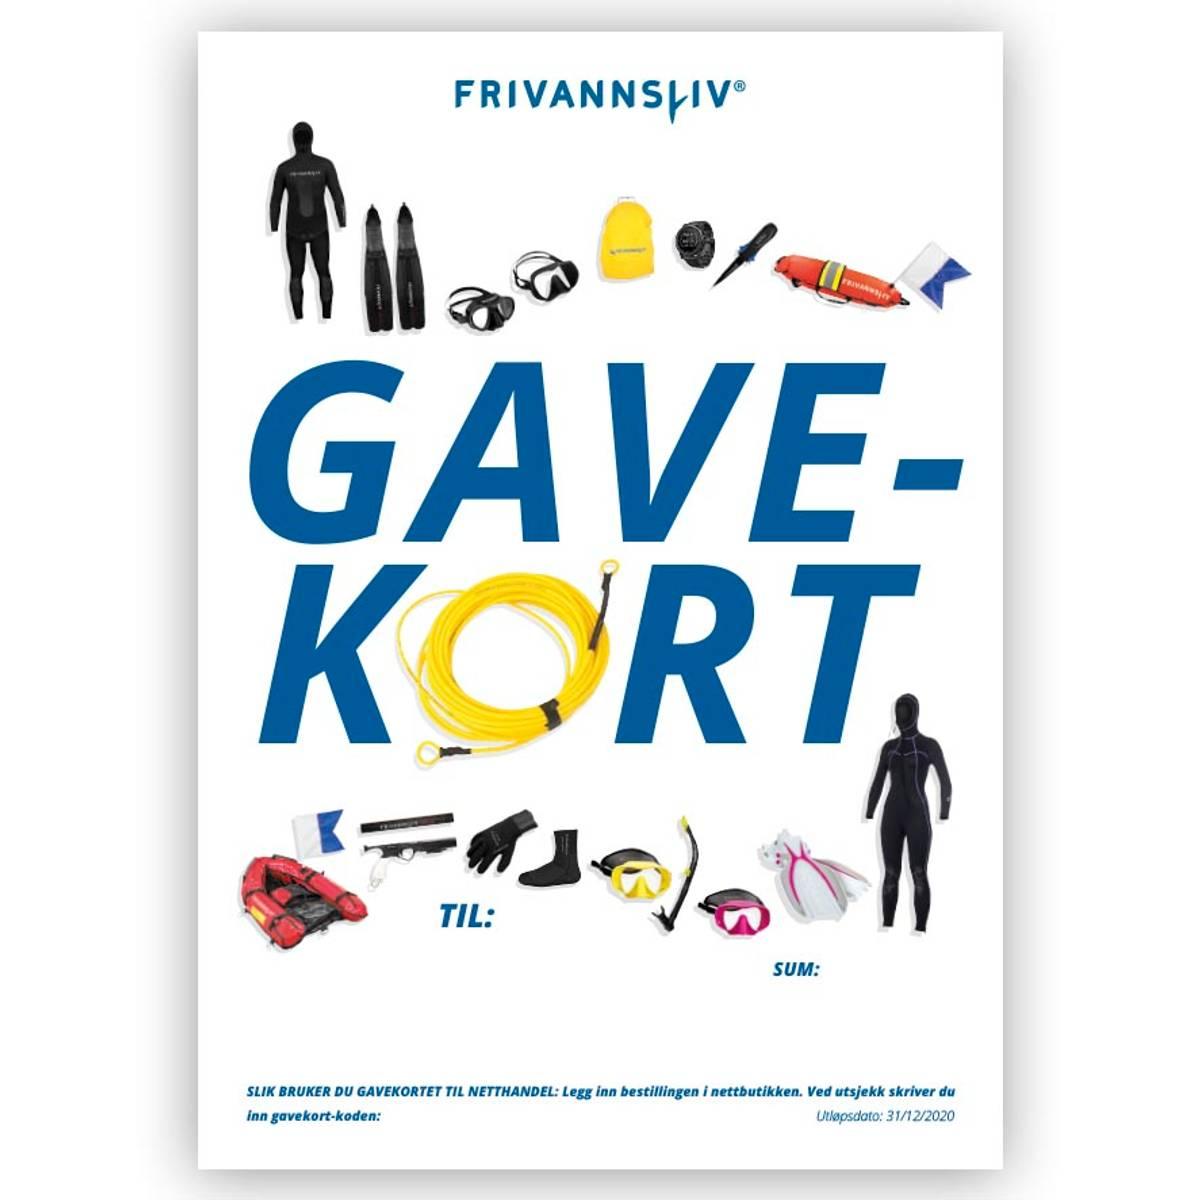 Gavekort Frivannsliv®